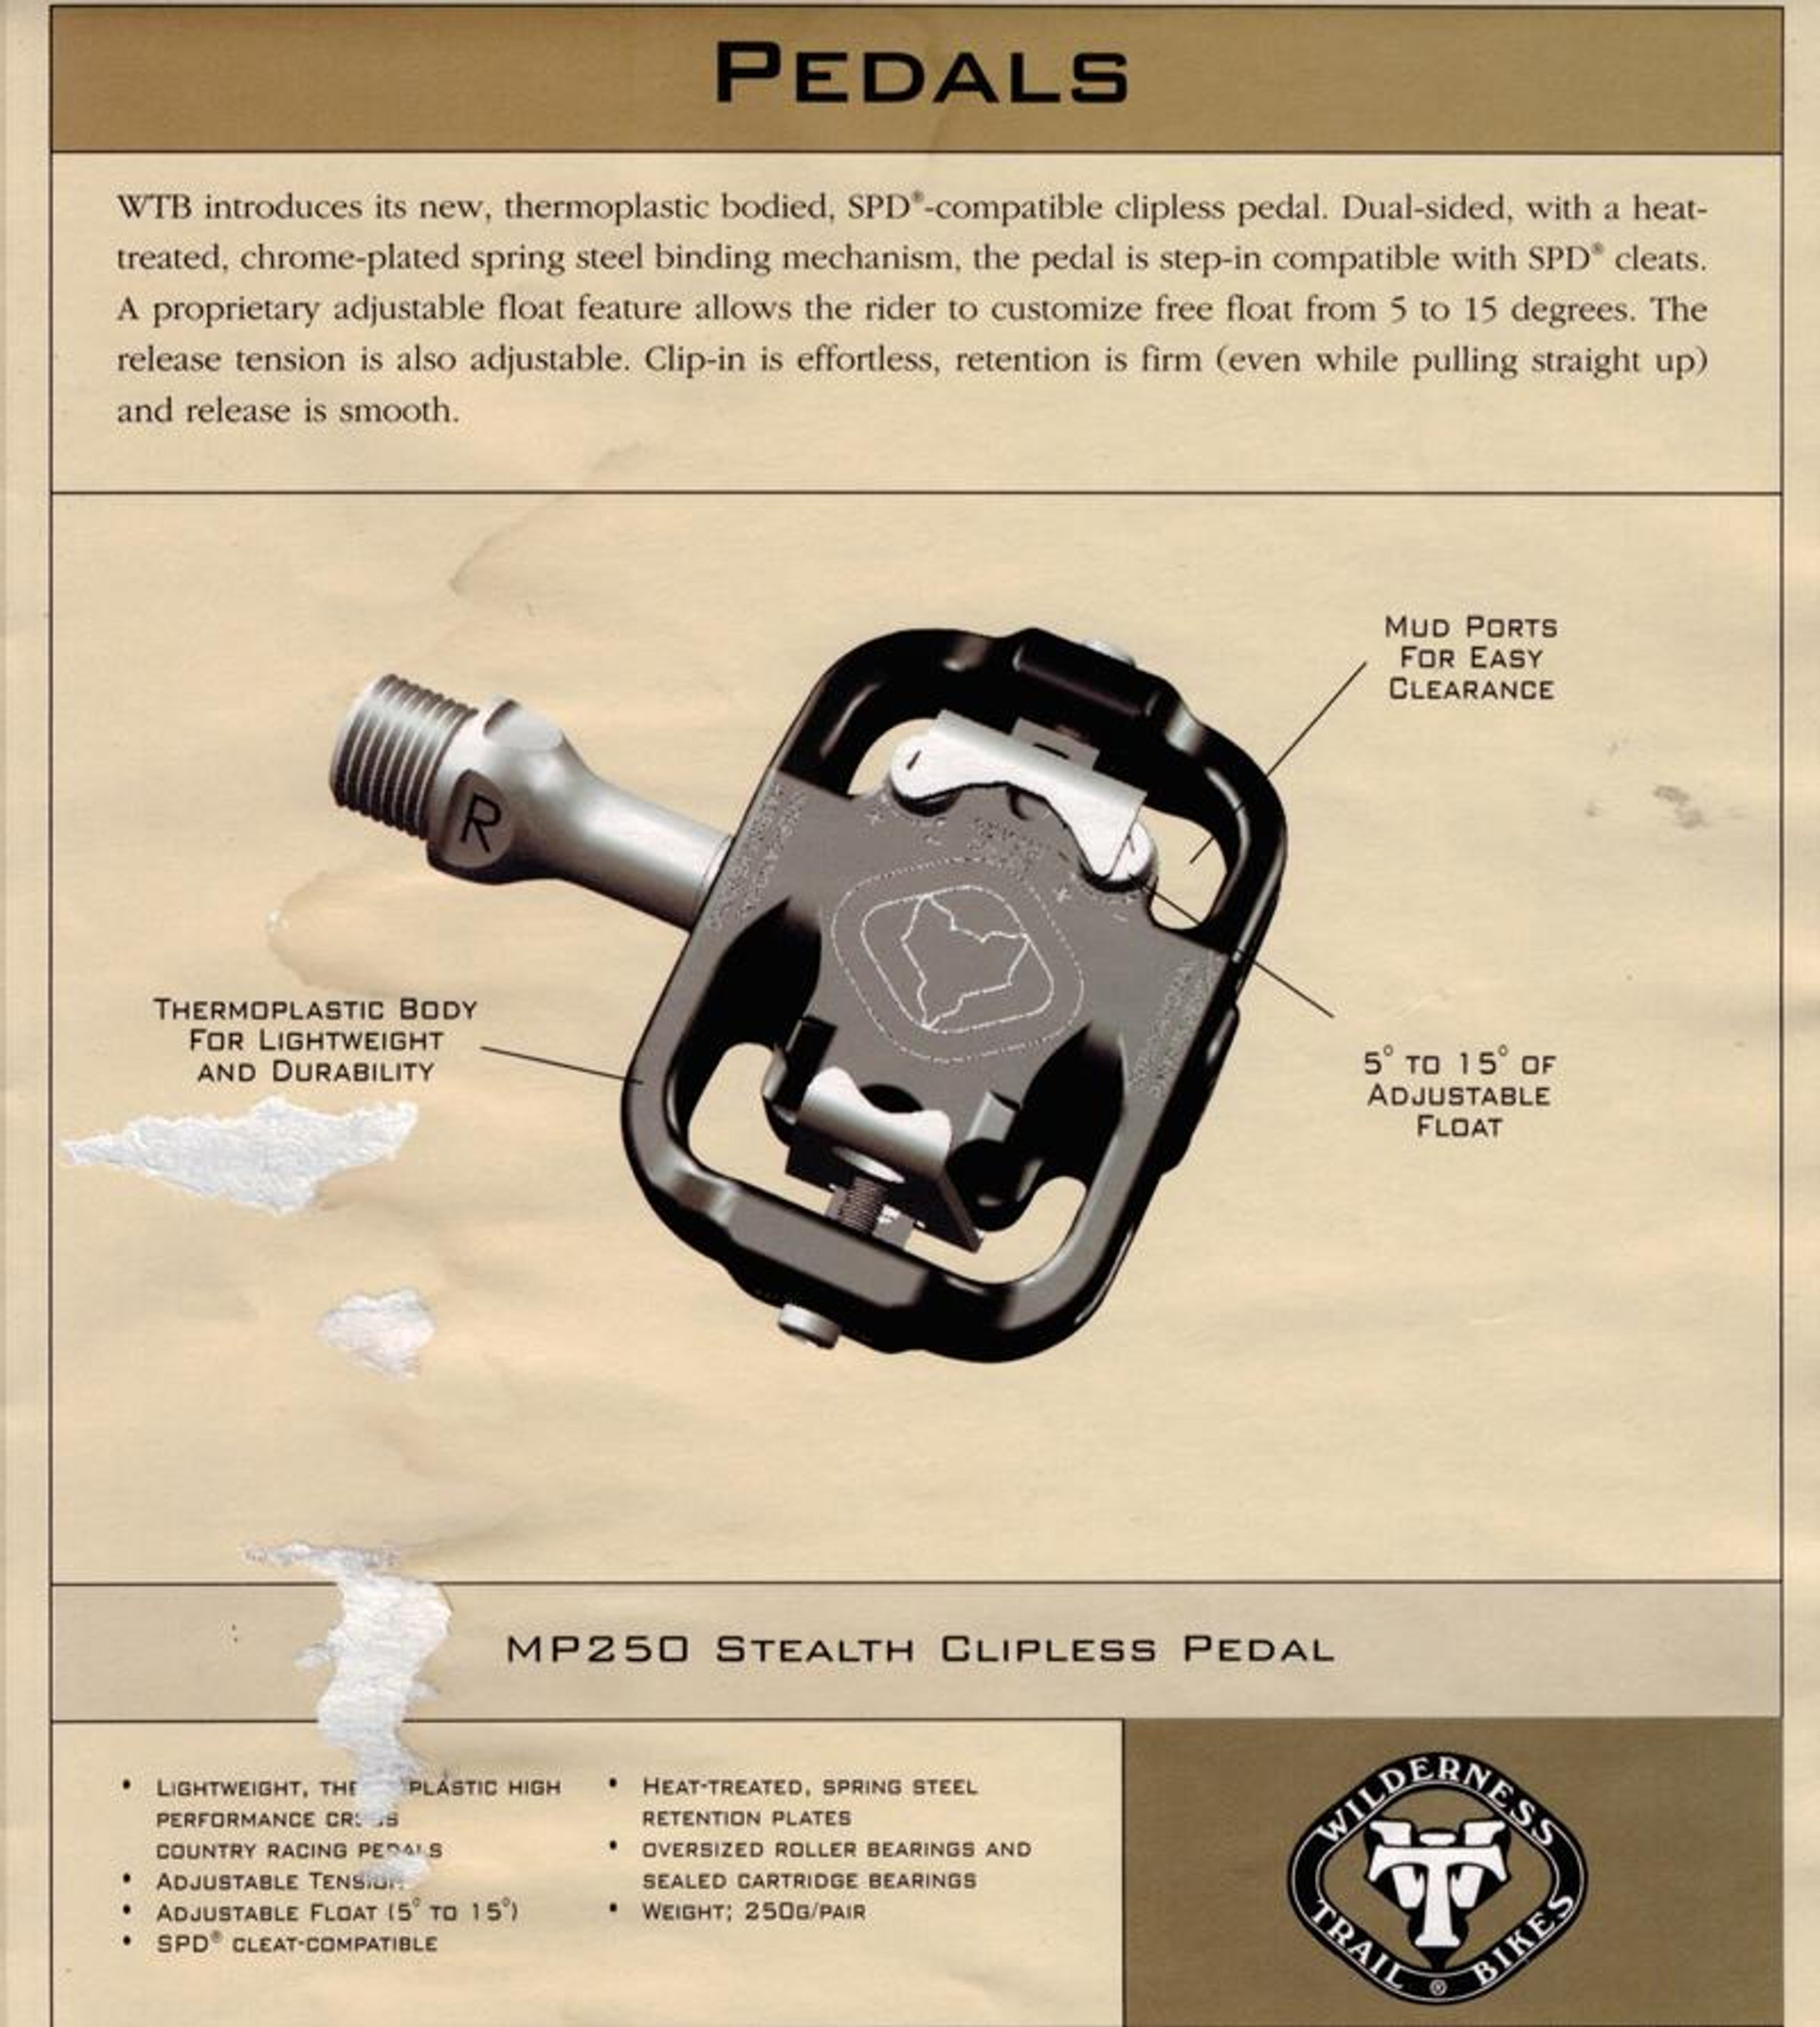 WTB Thermoplastic Catalog scan